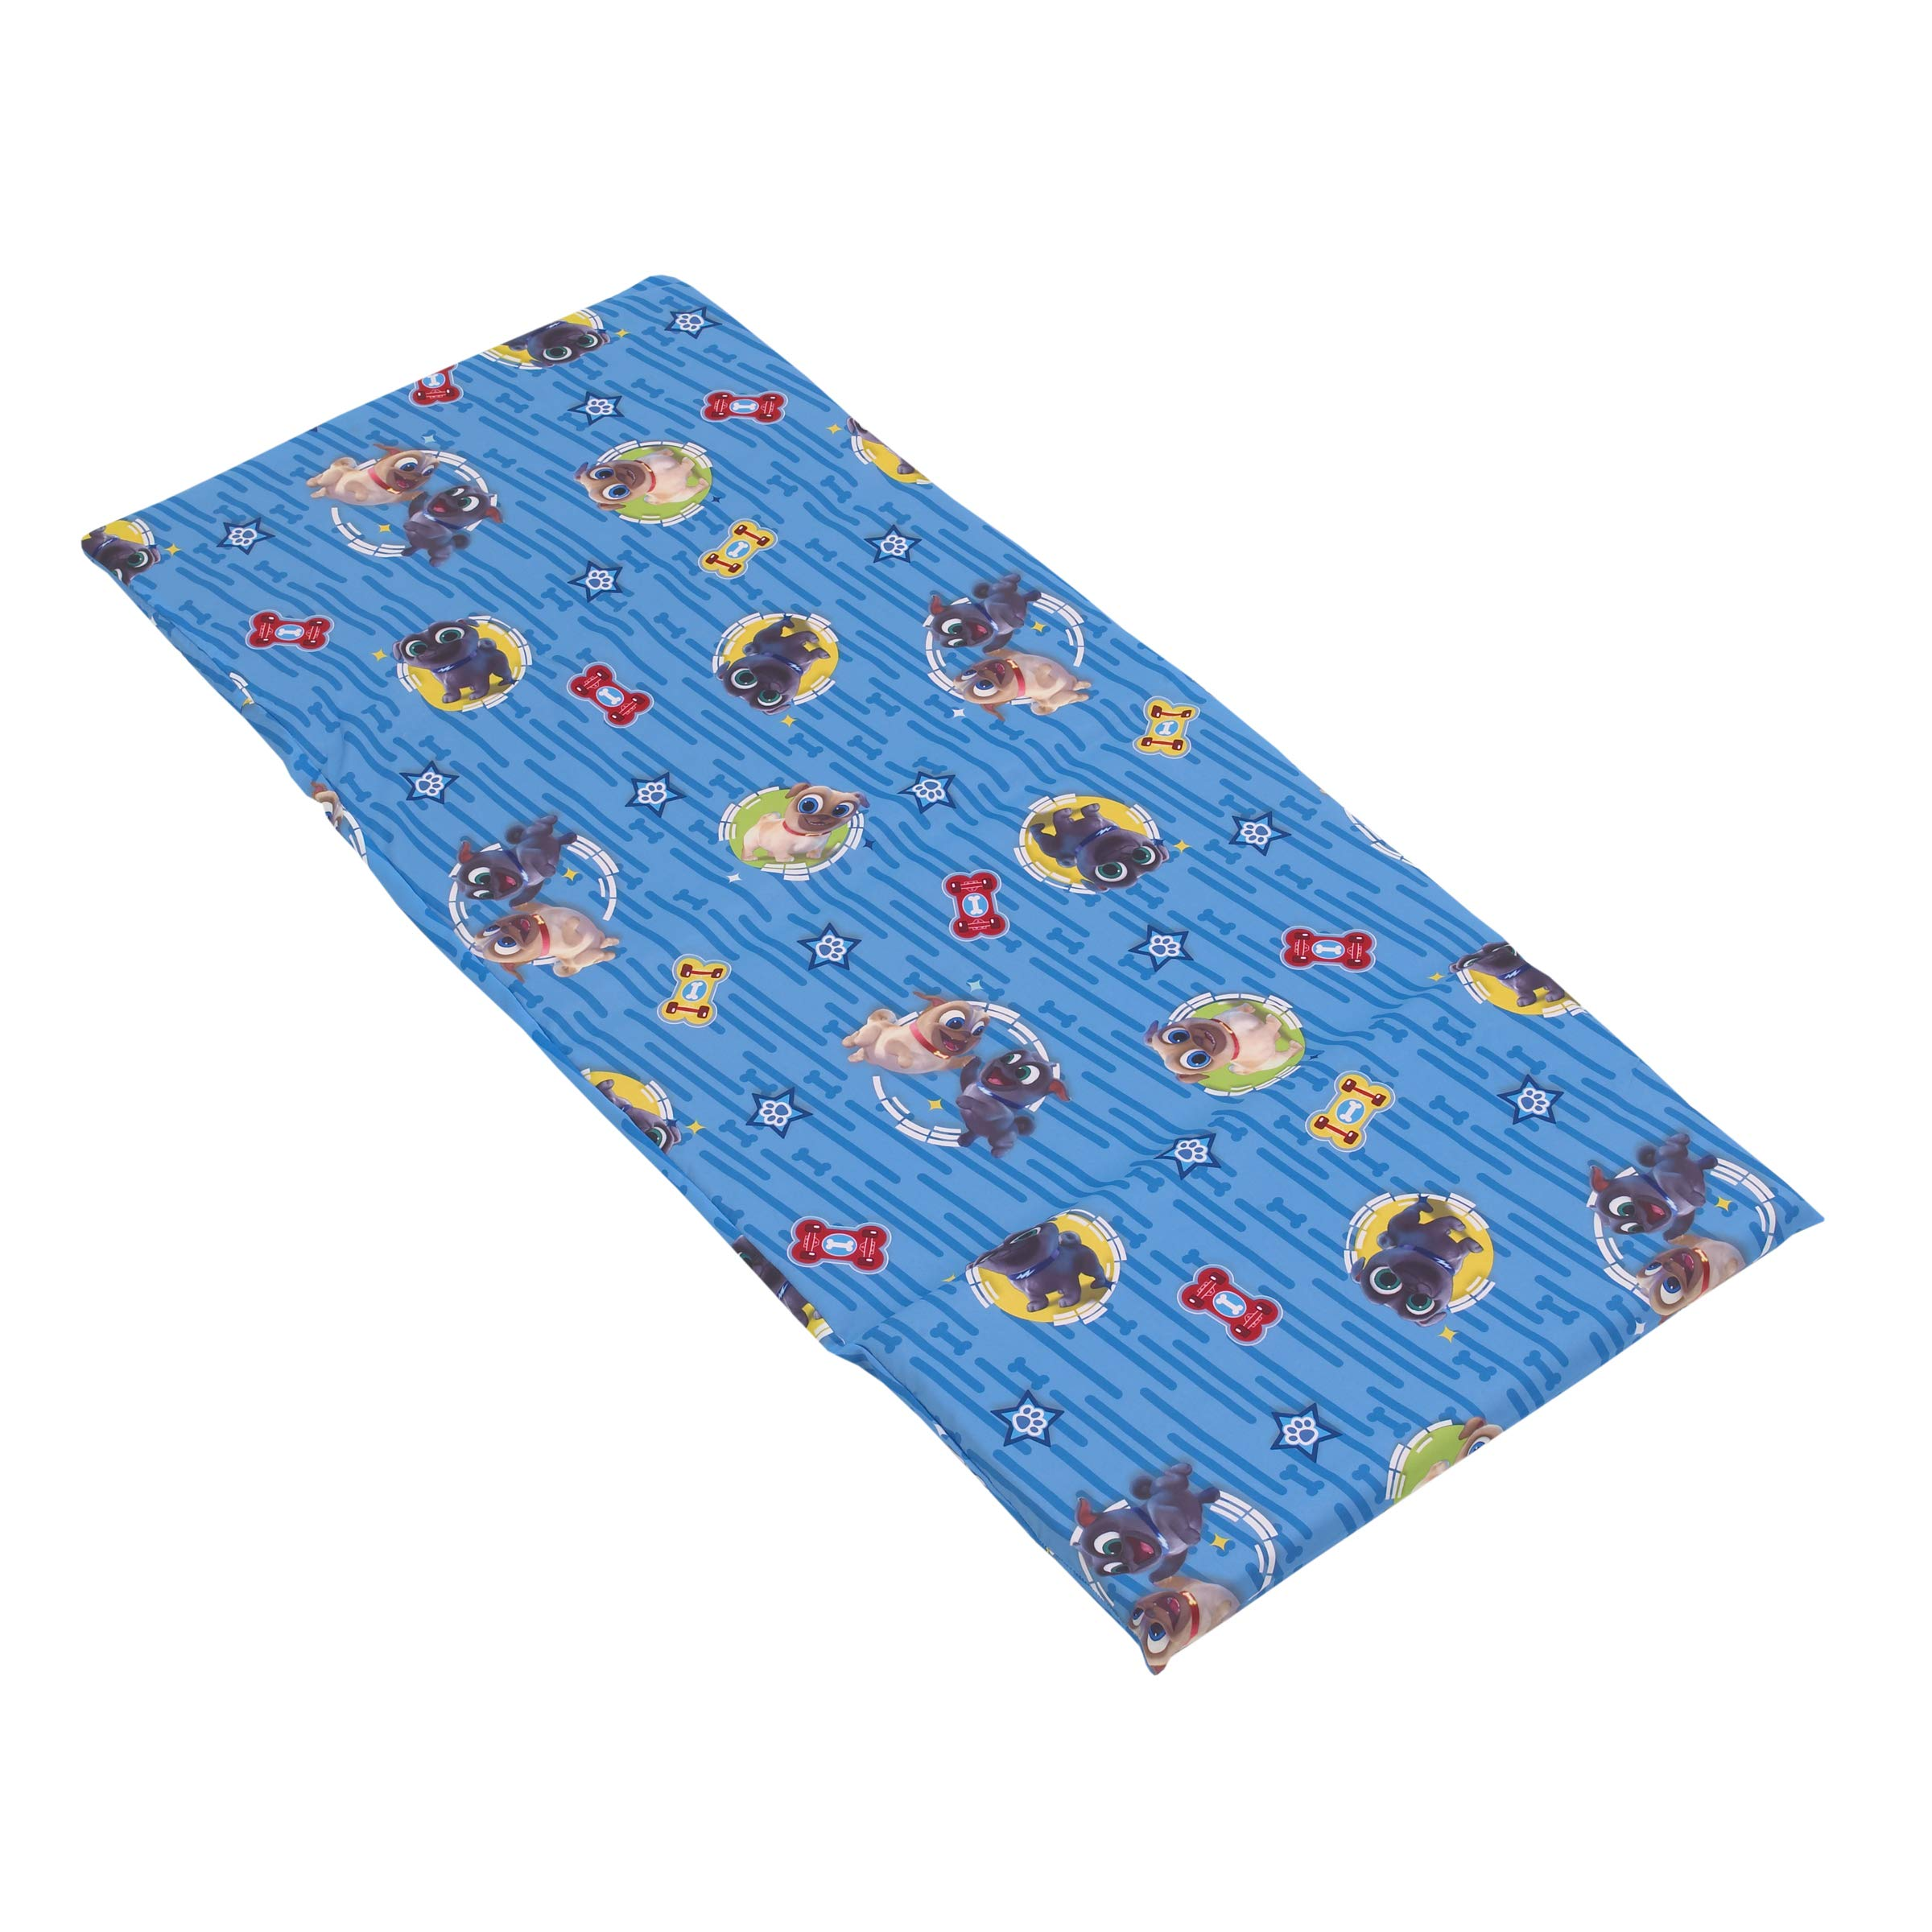 Disney Puppy Dog Pals - Blue, Grey, Yellow & Red Preschool Nap Pad Sheet, Blue, Grey, Yellow, Red